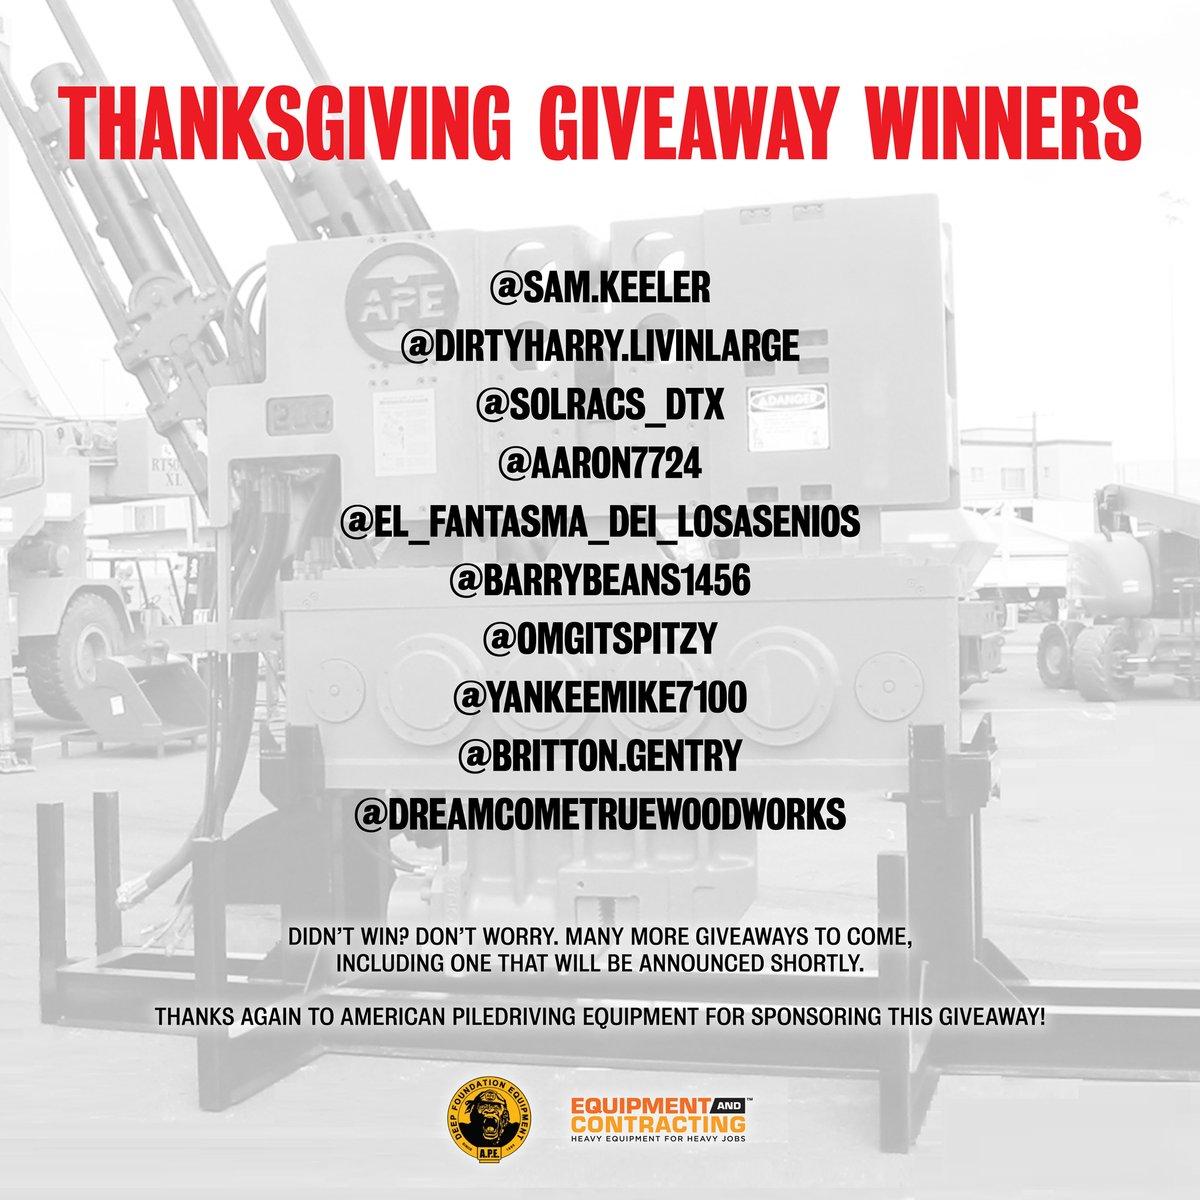 View Instagram Thanksgiving Giveaway Winners Here...  #equipmentandcontracting #pilebuck #goape